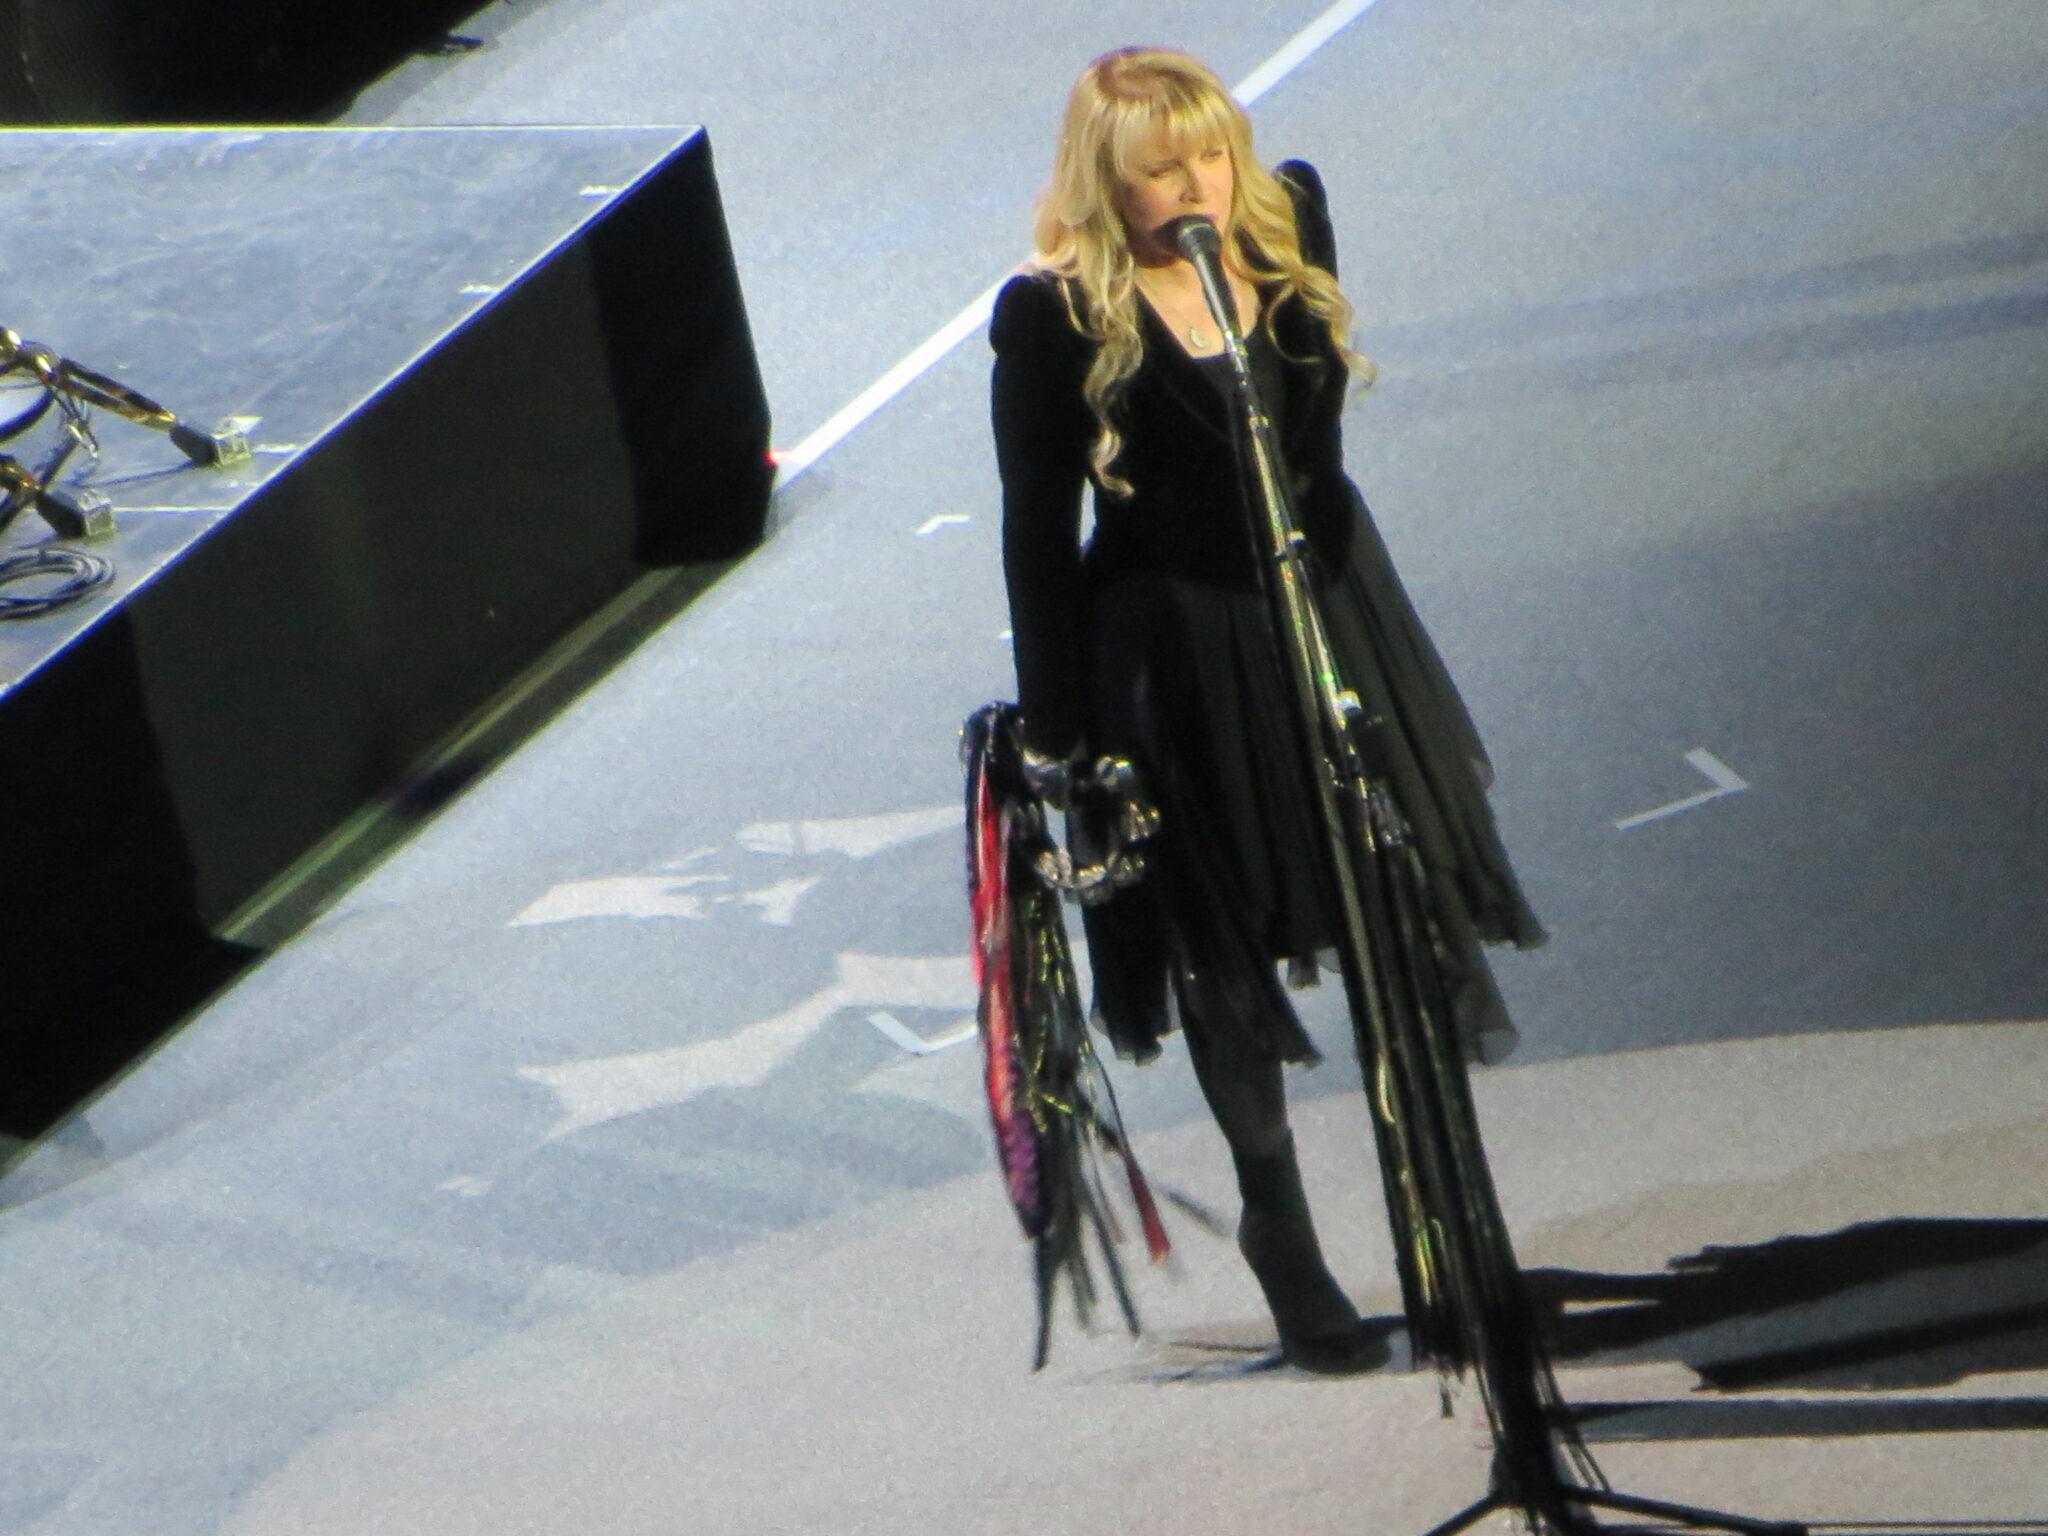 Stevie Nicks sings at the O2